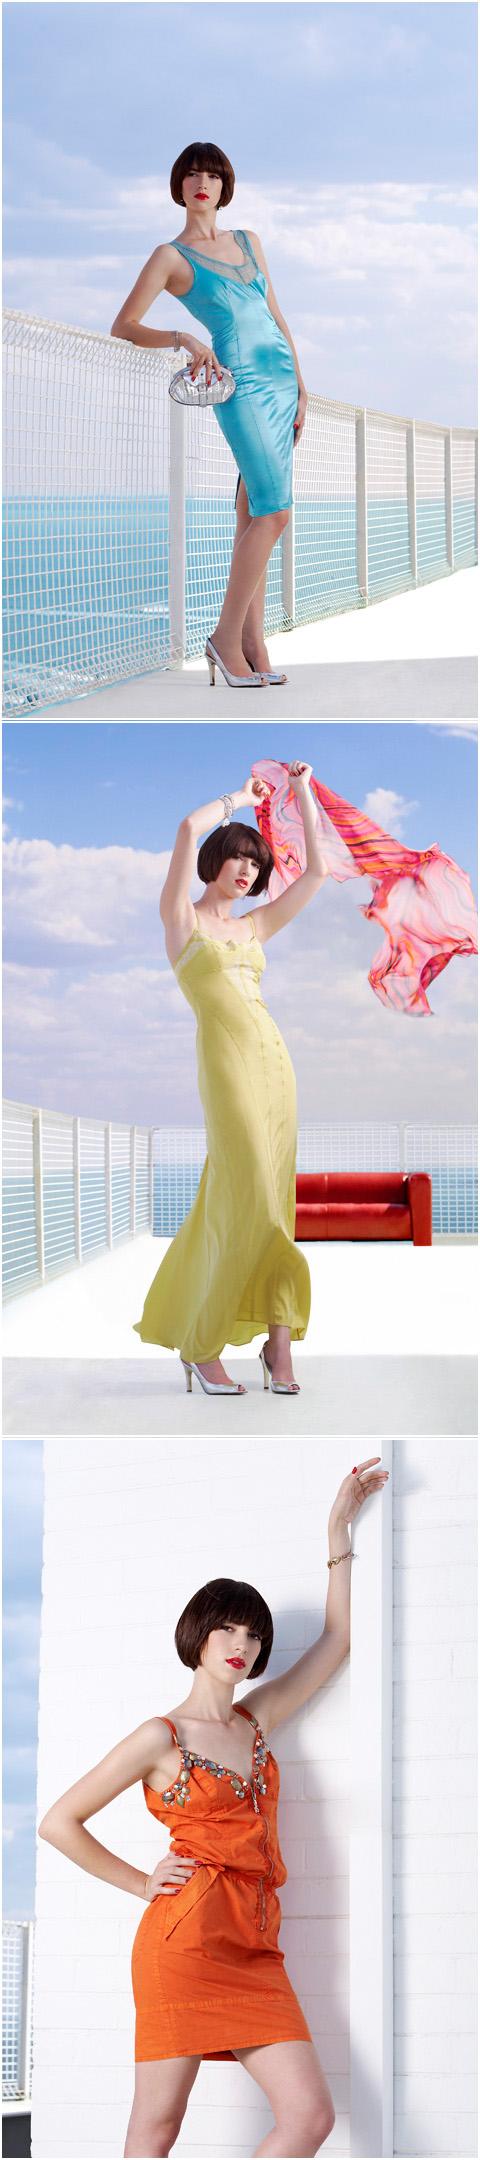 Apr 16, 2008 Laura Neumeister Model: Lani @ Viviens, Styling: Vass Arvanitis